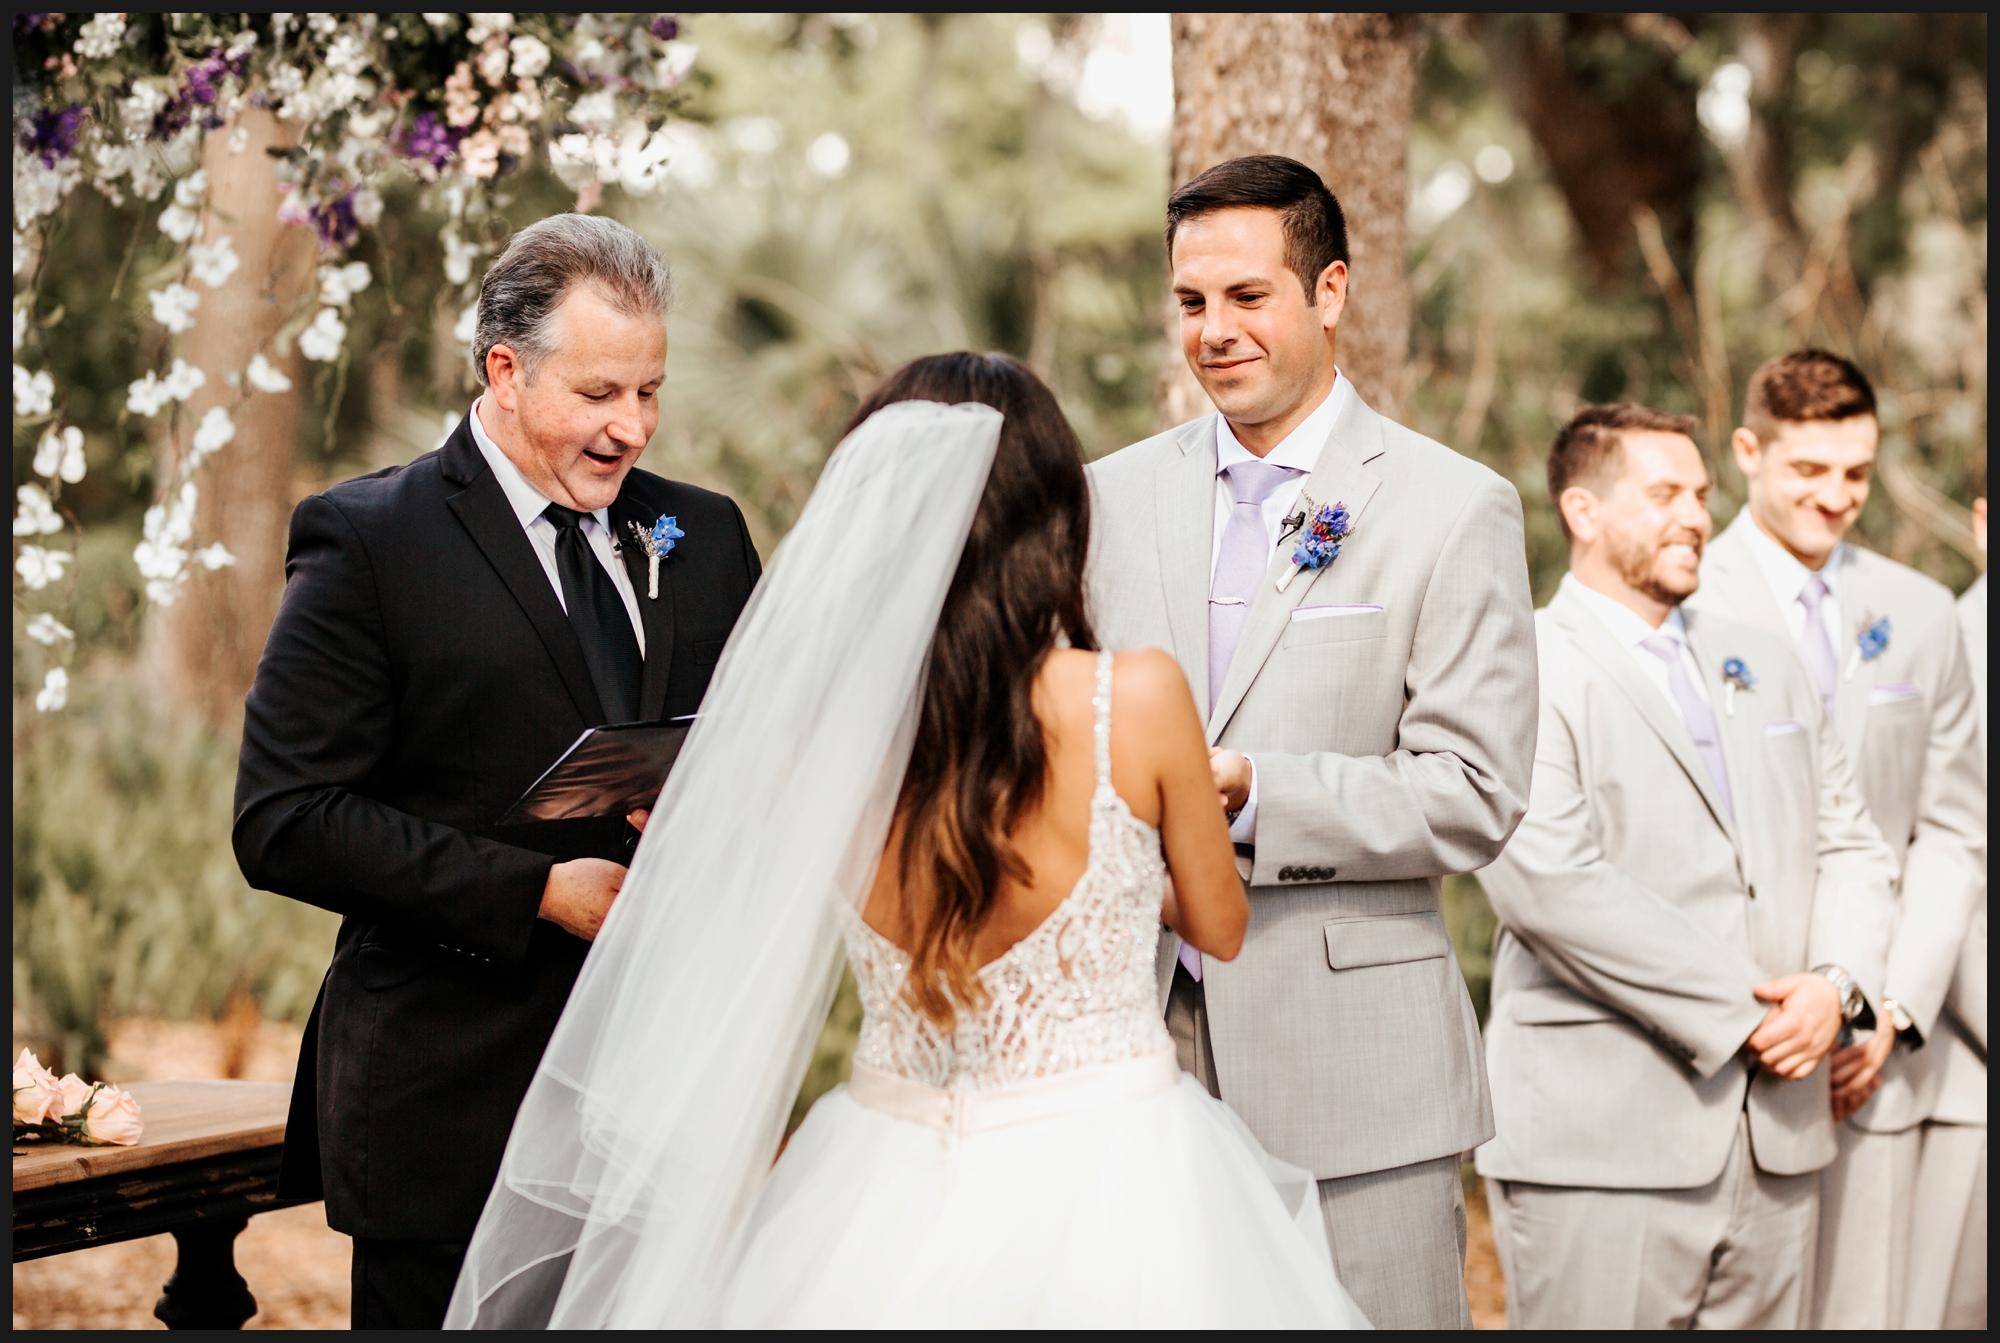 Orlando-Wedding-Photographer-destination-wedding-photographer-florida-wedding-photographer-bohemian-wedding-photographer_1612.jpg